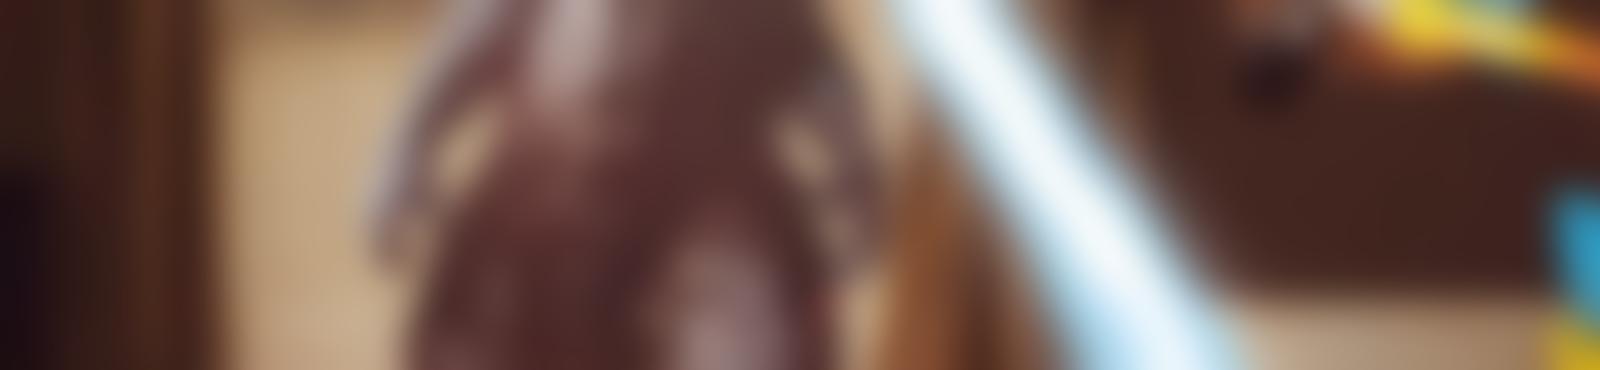 Blurred 3a5788f6 c2e5 4a69 b7c8 e993deea1fe0